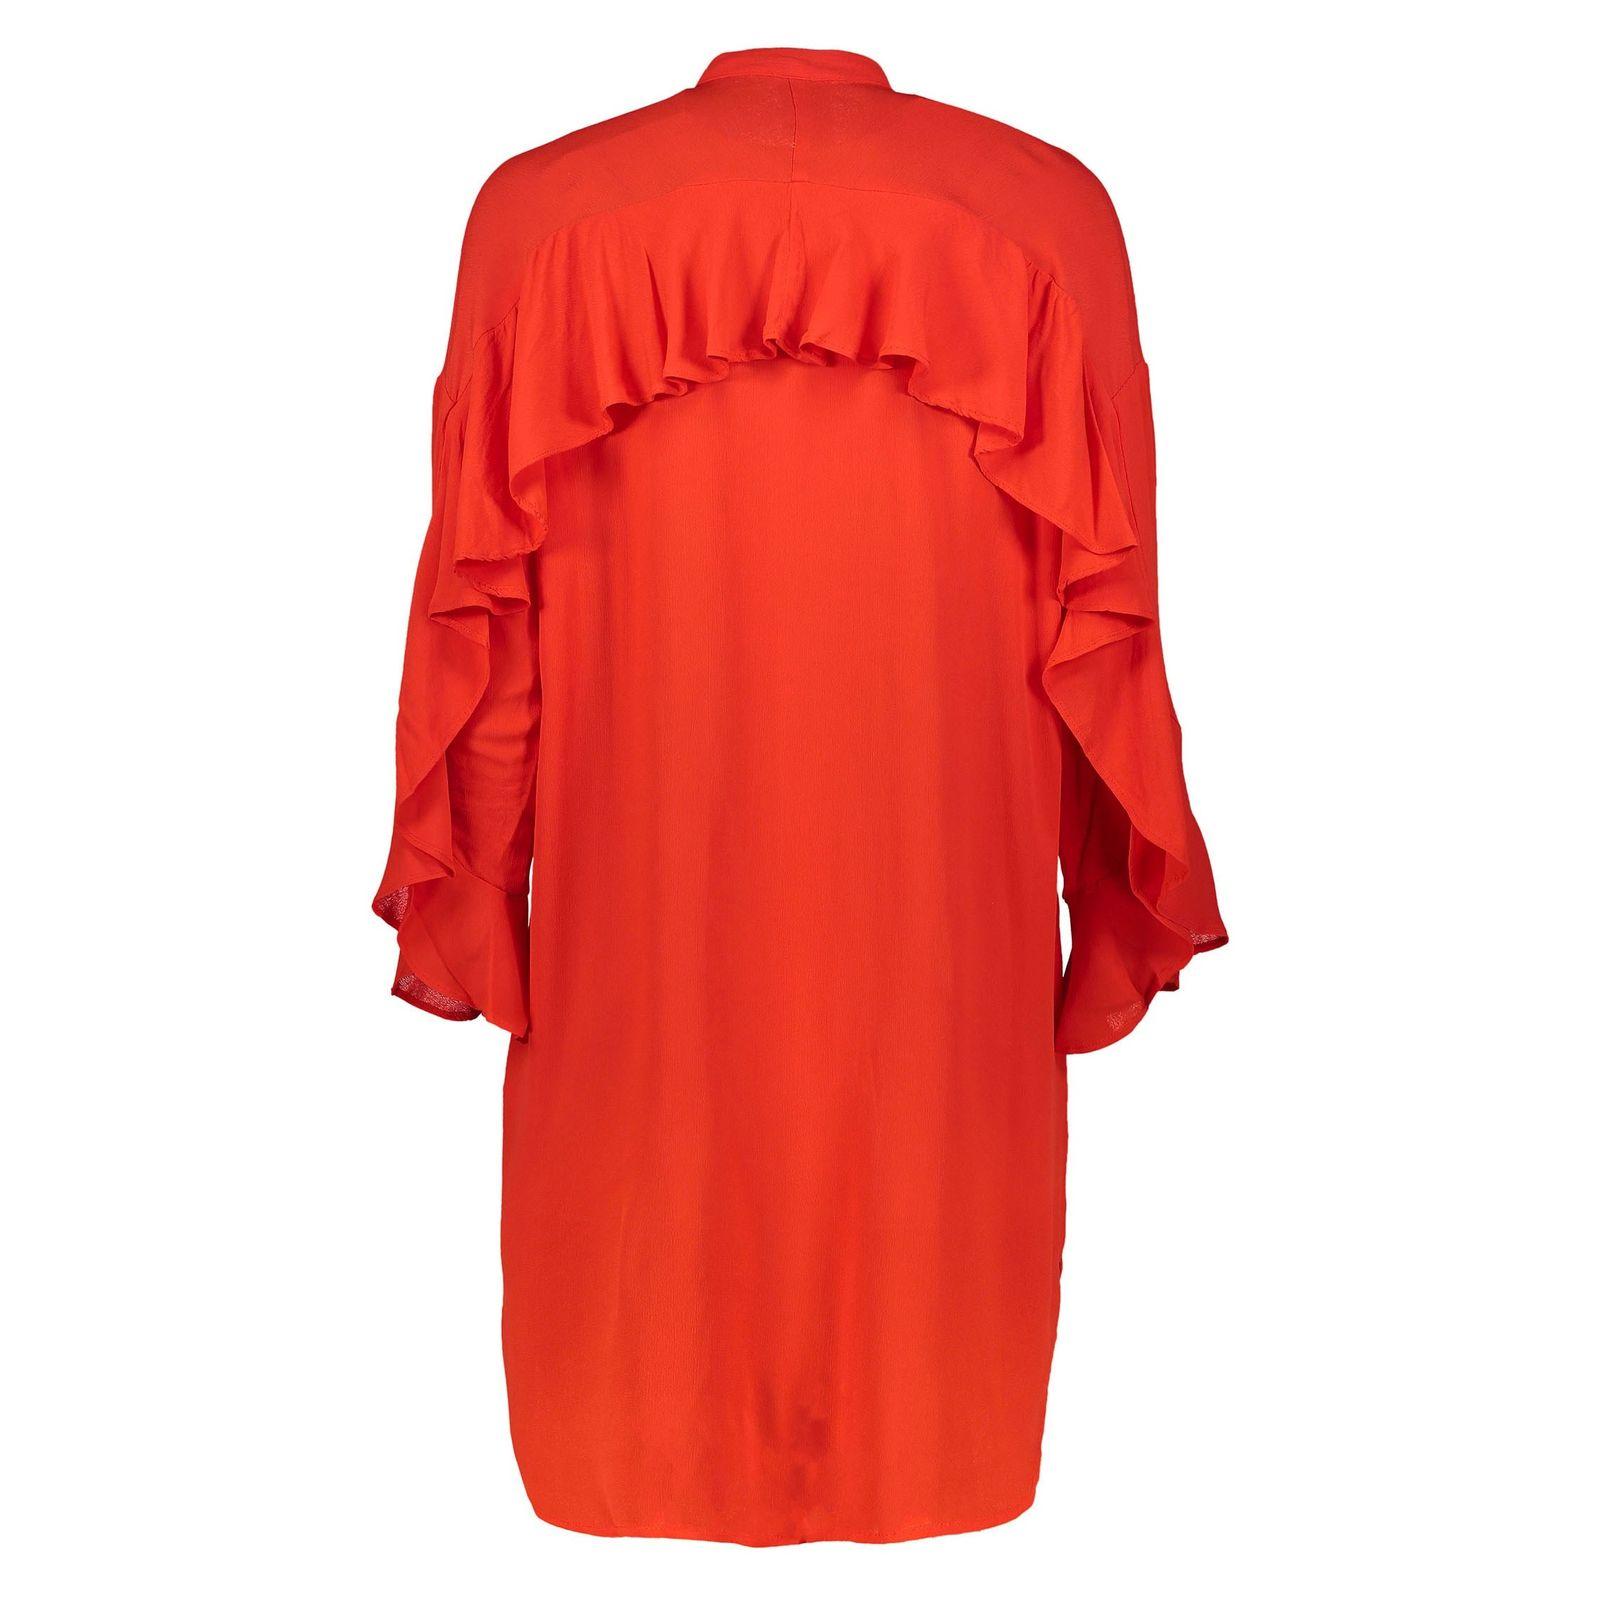 تونیک ویسکوز بلند زنانه - ورو مدا - قرمز - 2